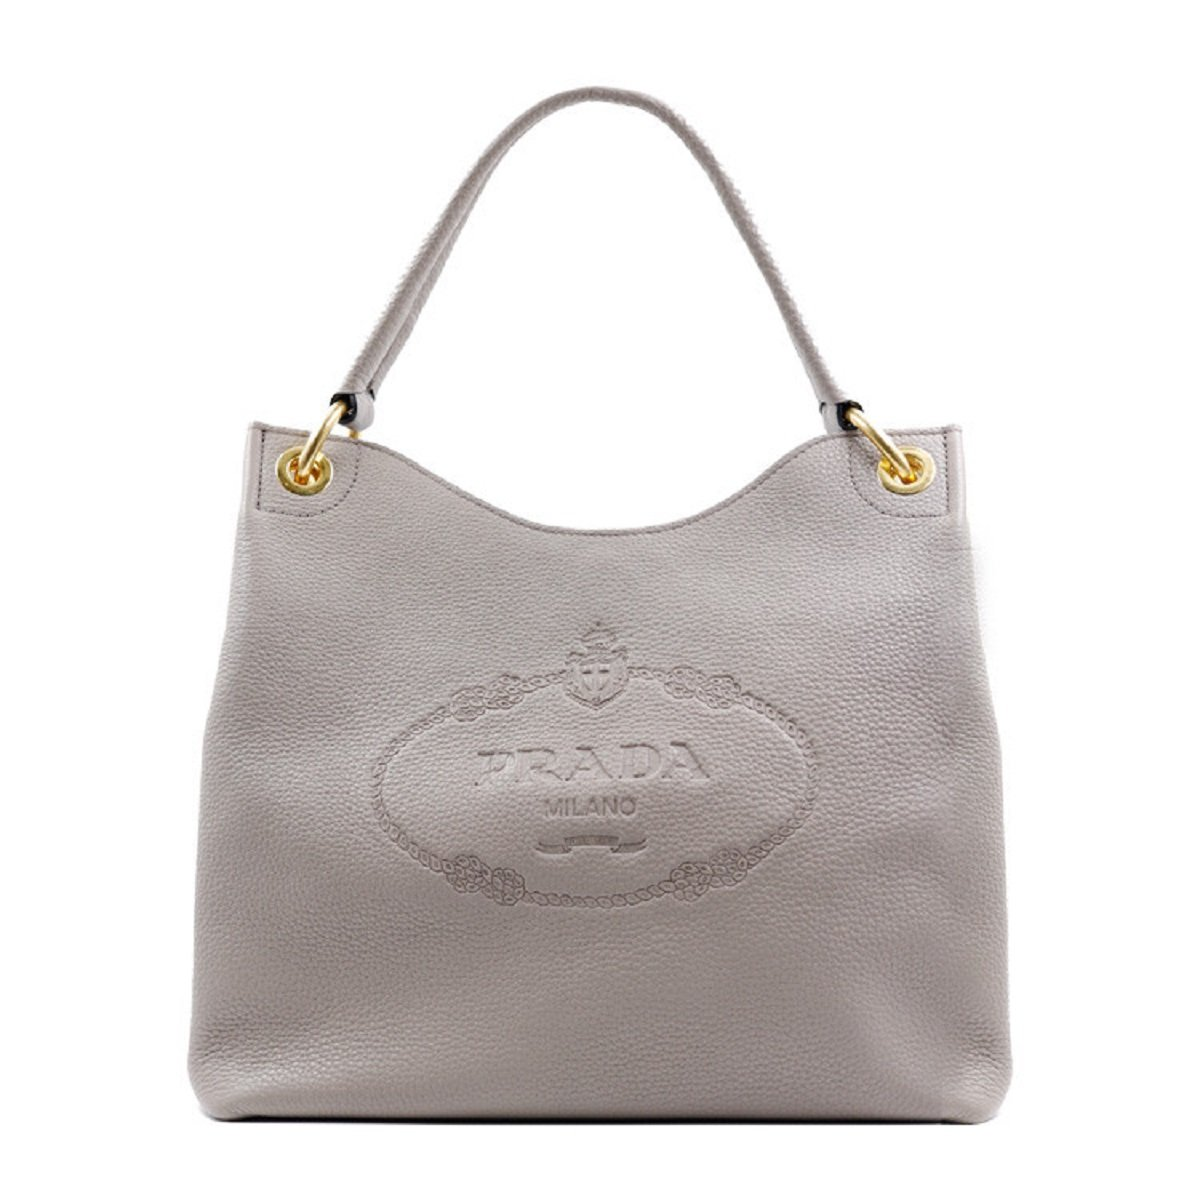 71515c51eaea Prada Women's Vitello Daino Grey Leather Satchel Bag Handbag 1BC051:  Amazon.co.uk: Shoes & Bags